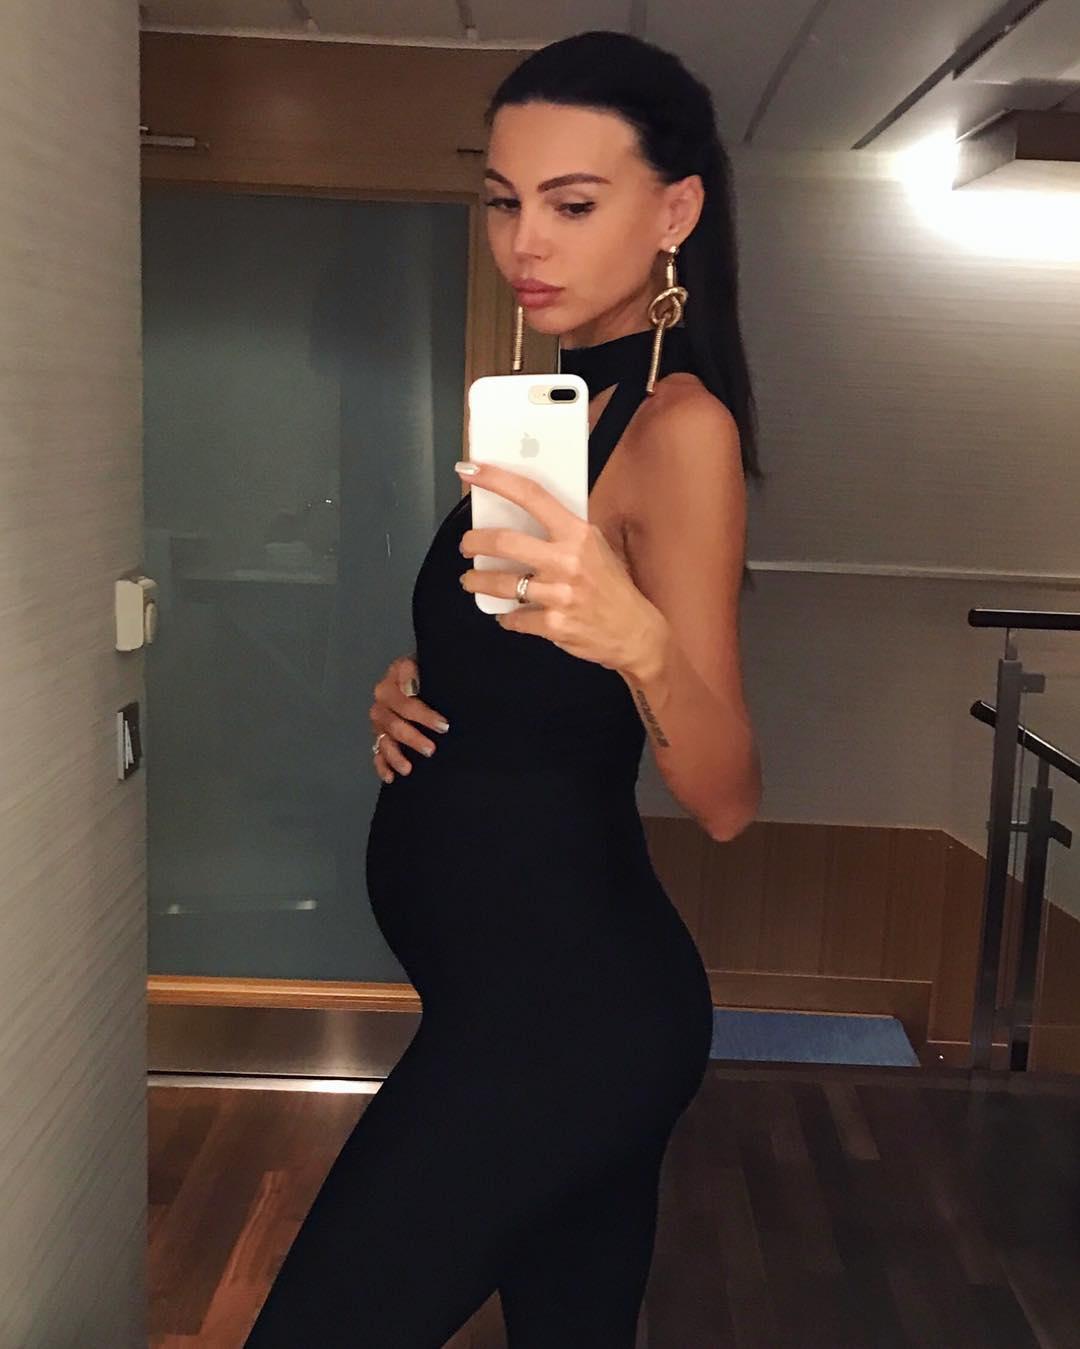 Оксана Самойлова биография модели фото рост и вес